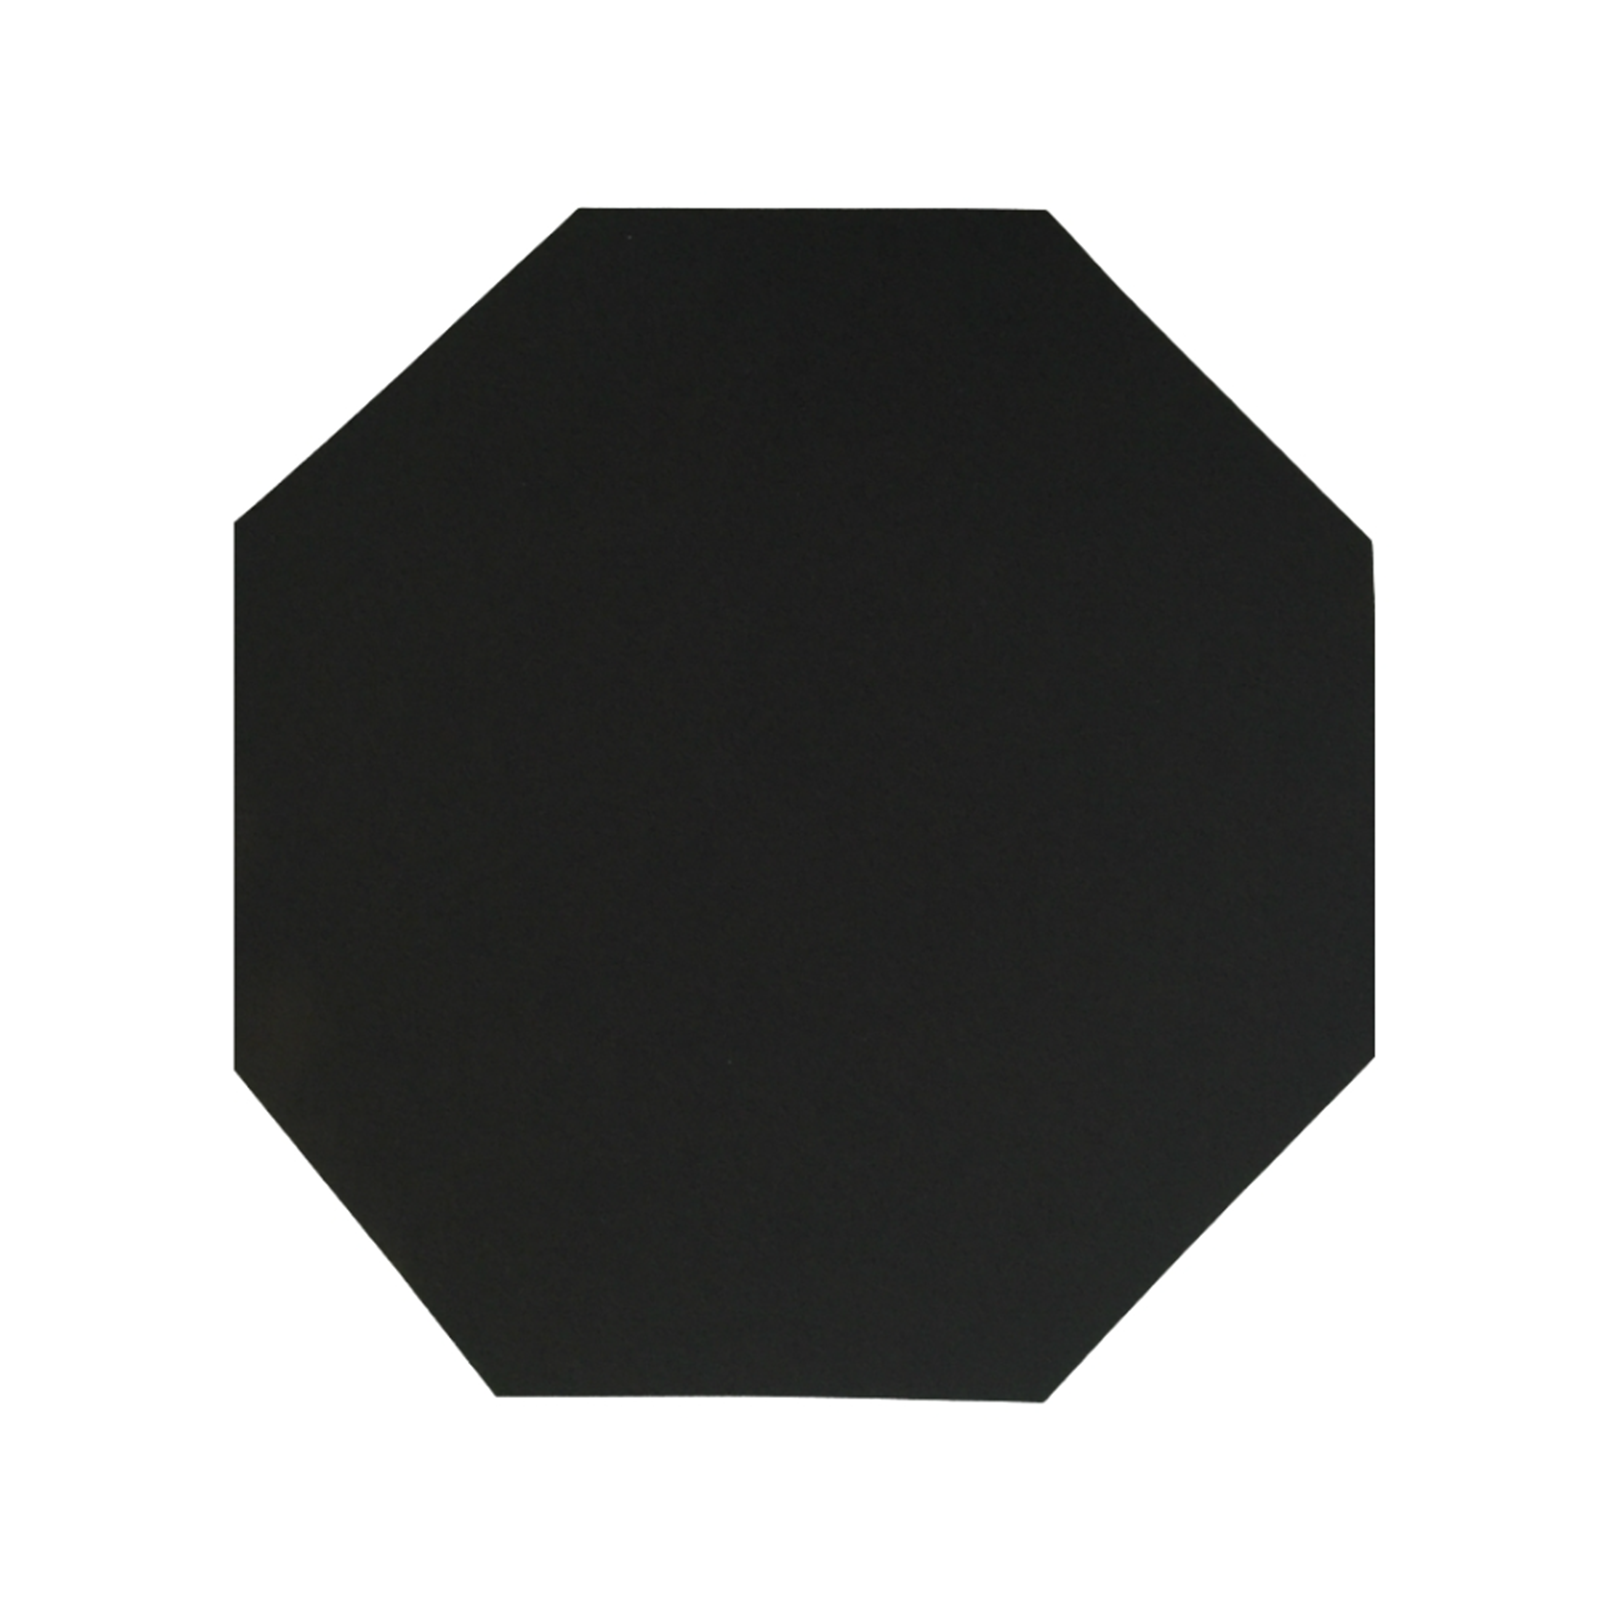 SEJ Design – Dækkeserviet Ottekantet – 38 x 38 cm